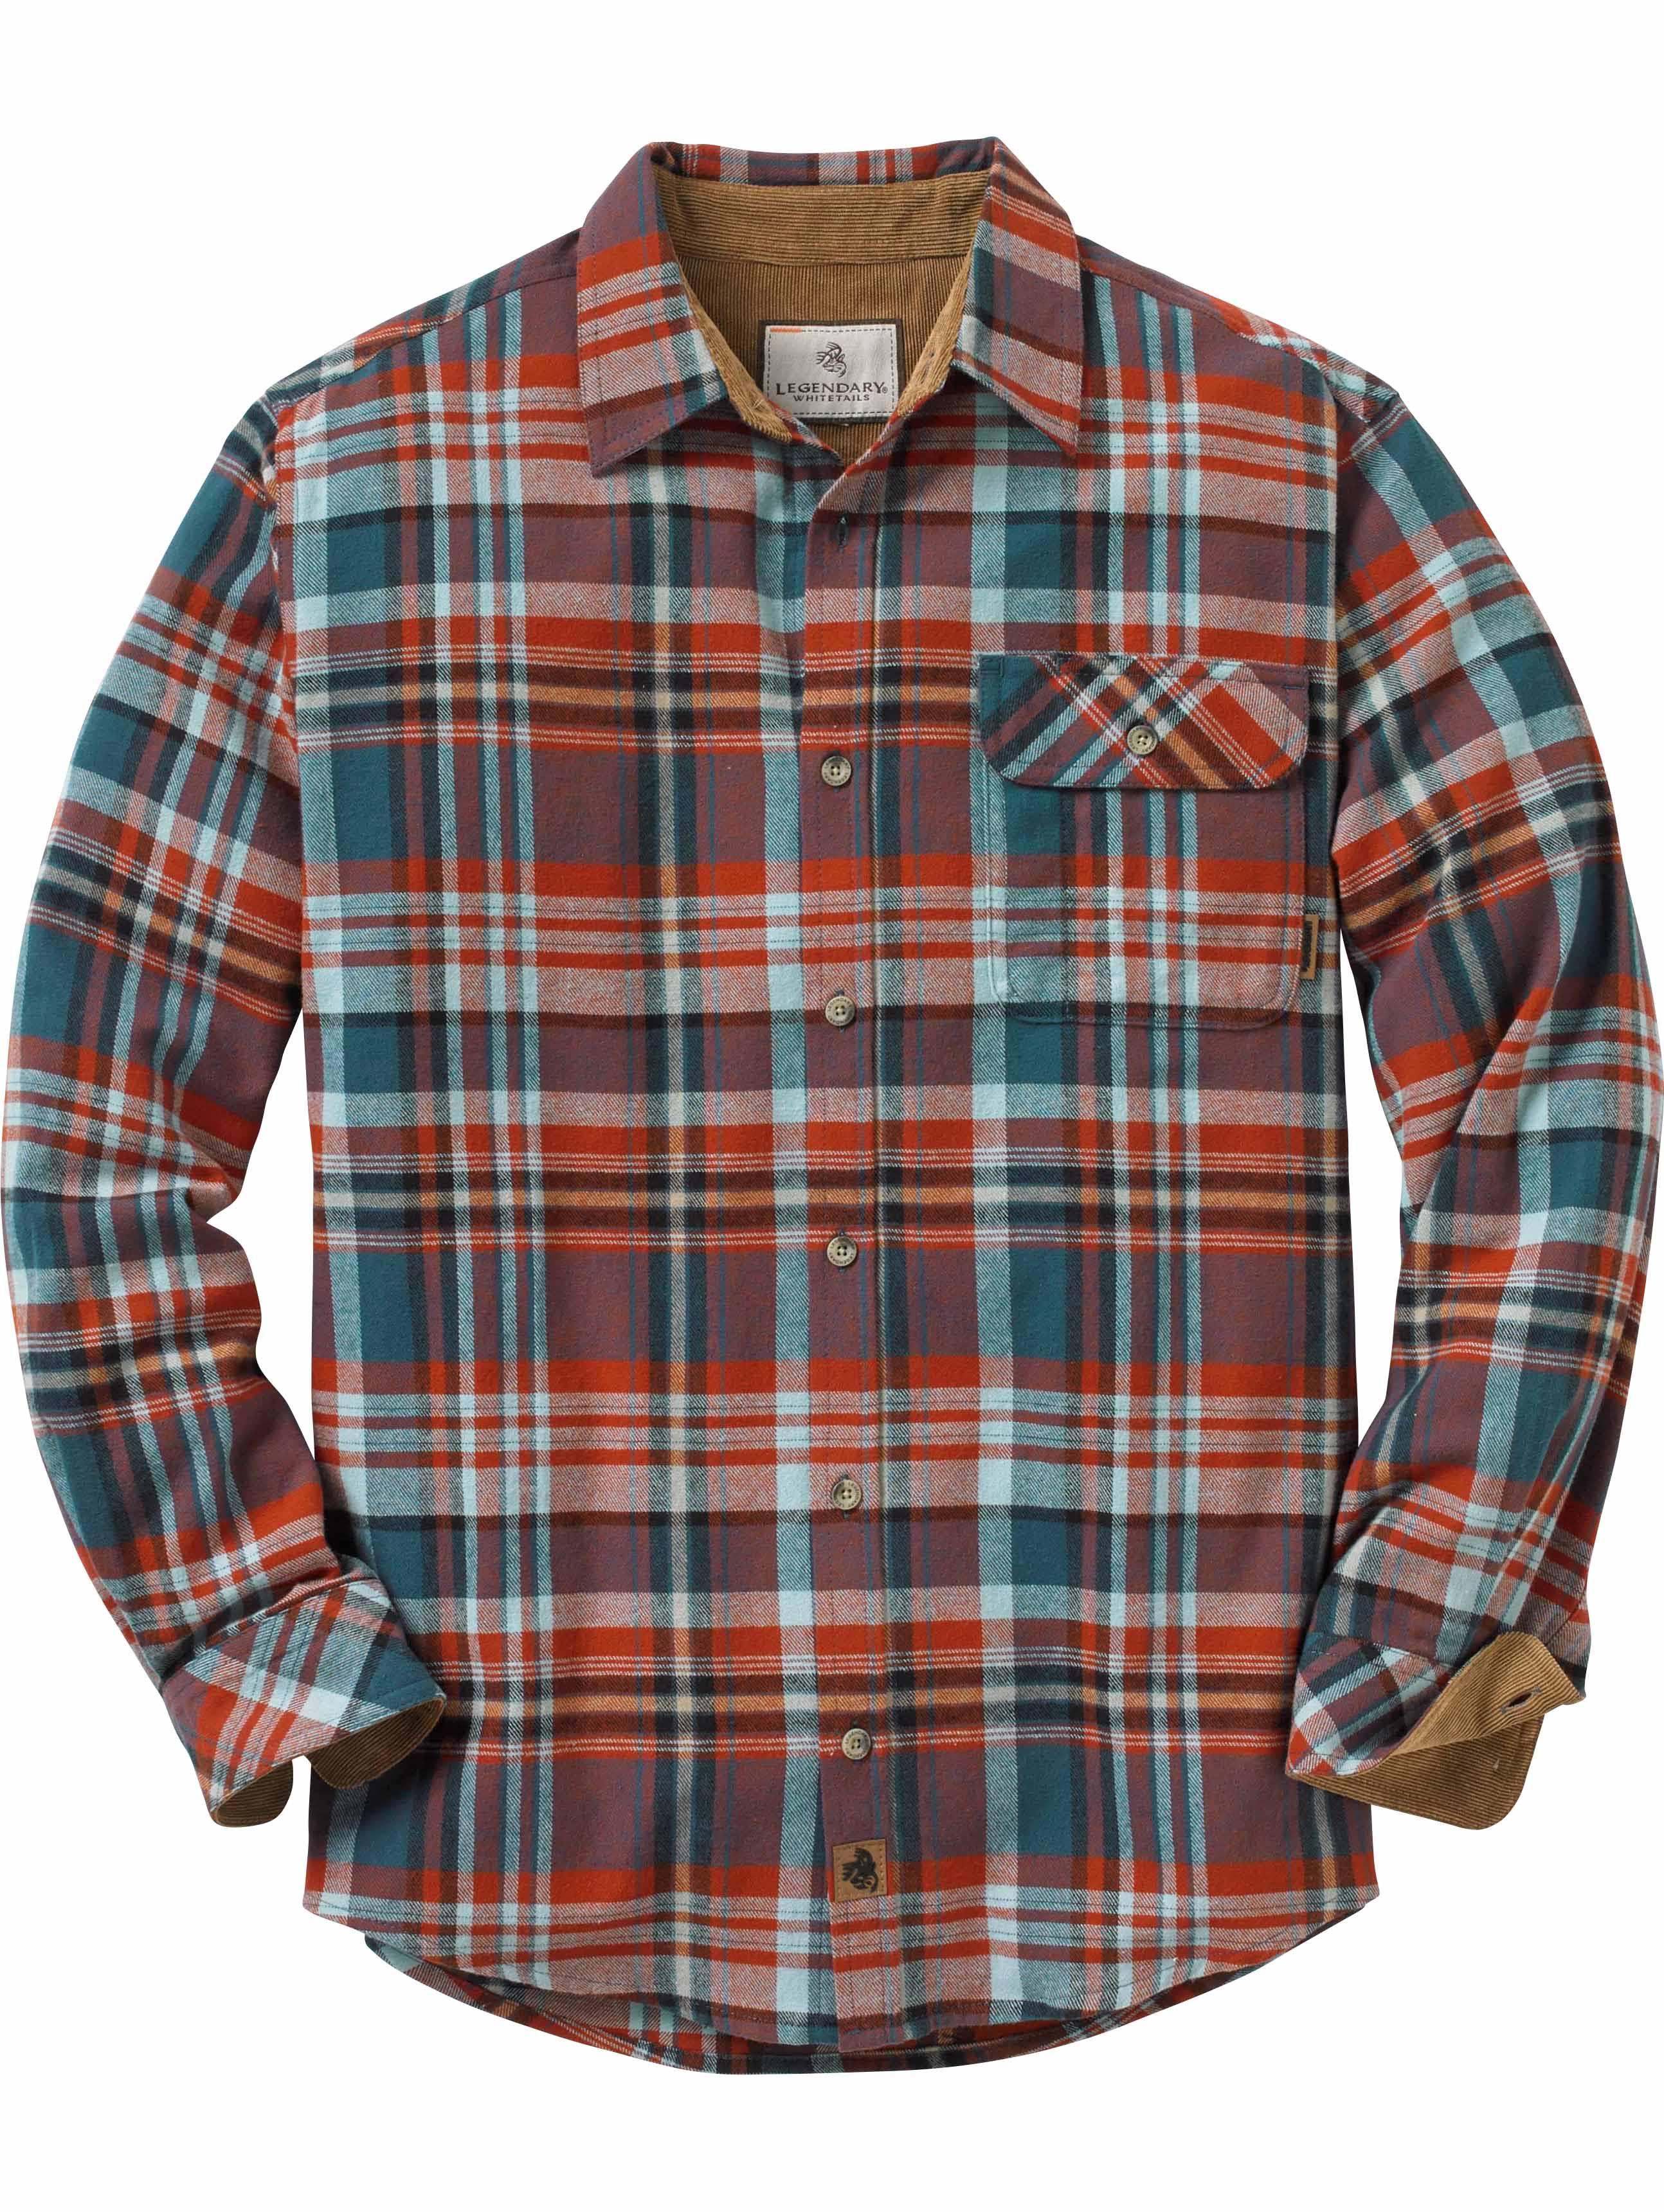 Gris Xxl Hombre Tamaño Legendary Camp Whitetails Flannels Plaid Buck 8nvRwCq